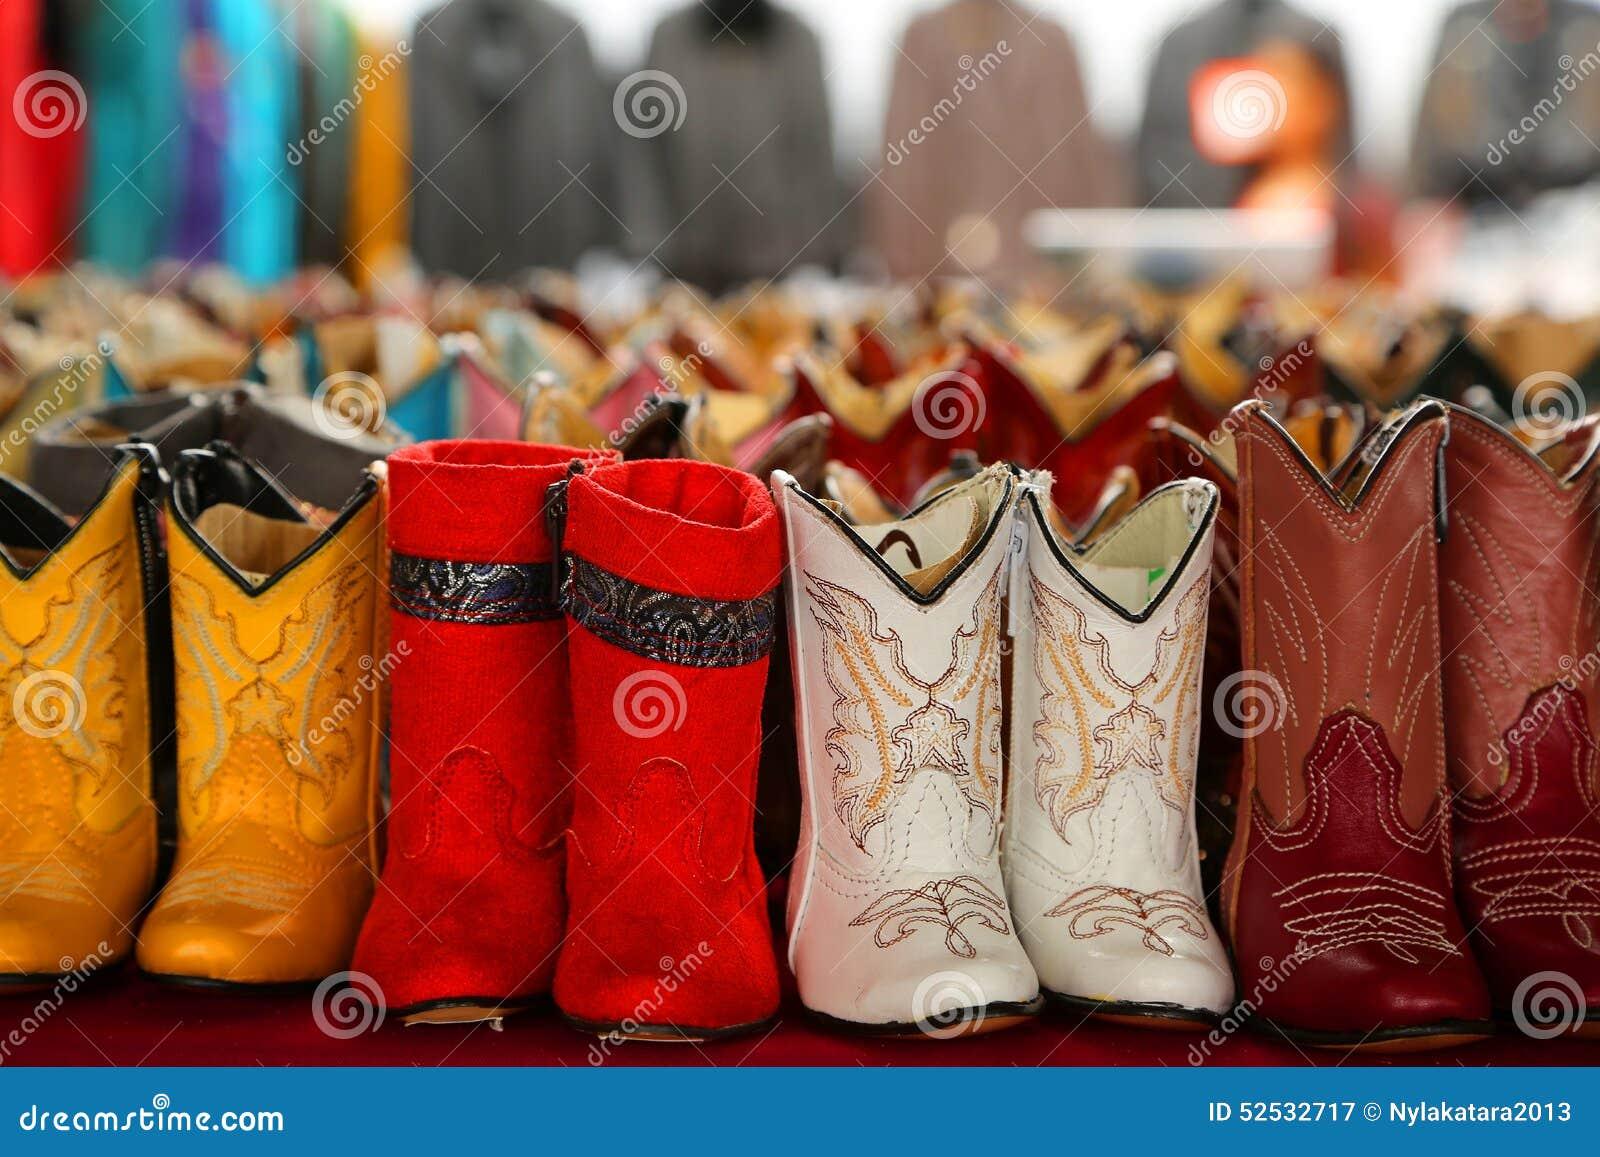 Carregadores de cowboy